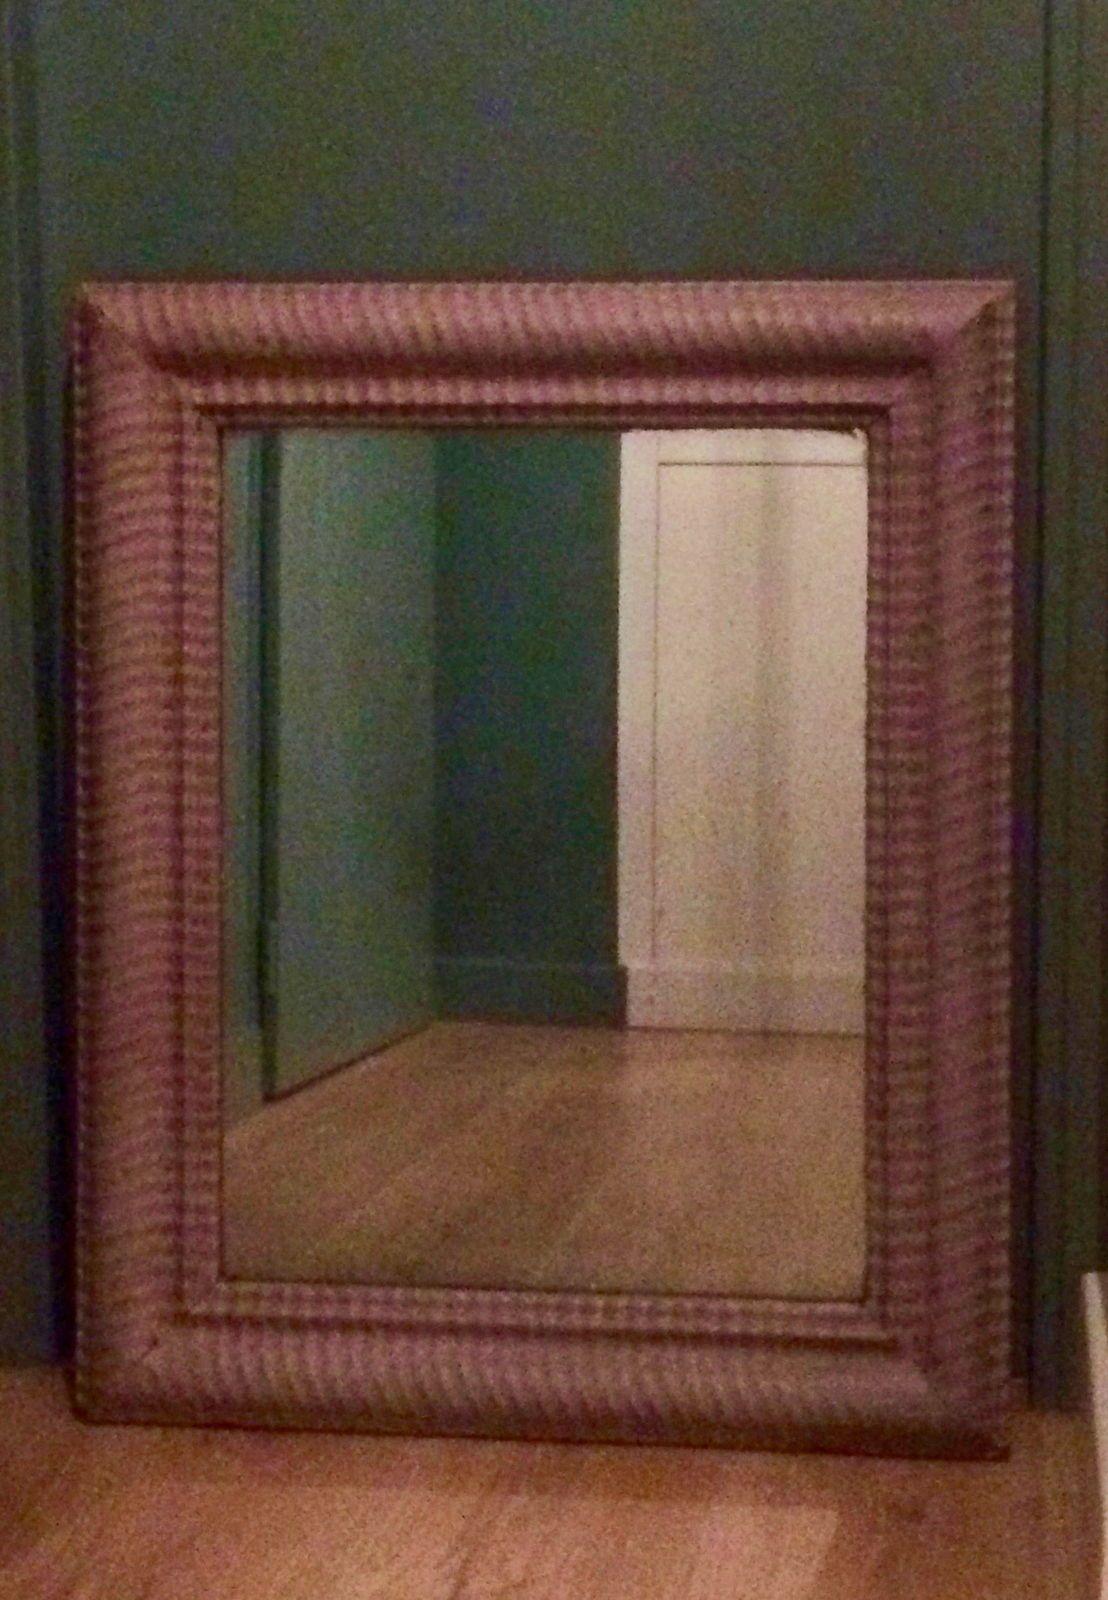 Miroir ancien peint